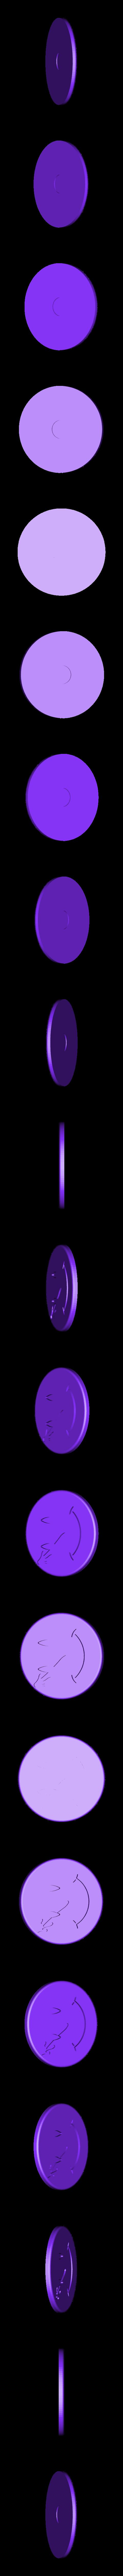 Centre_Watch.stl Download STL file Hand Spinner Watchmen • 3D printer model, Guich